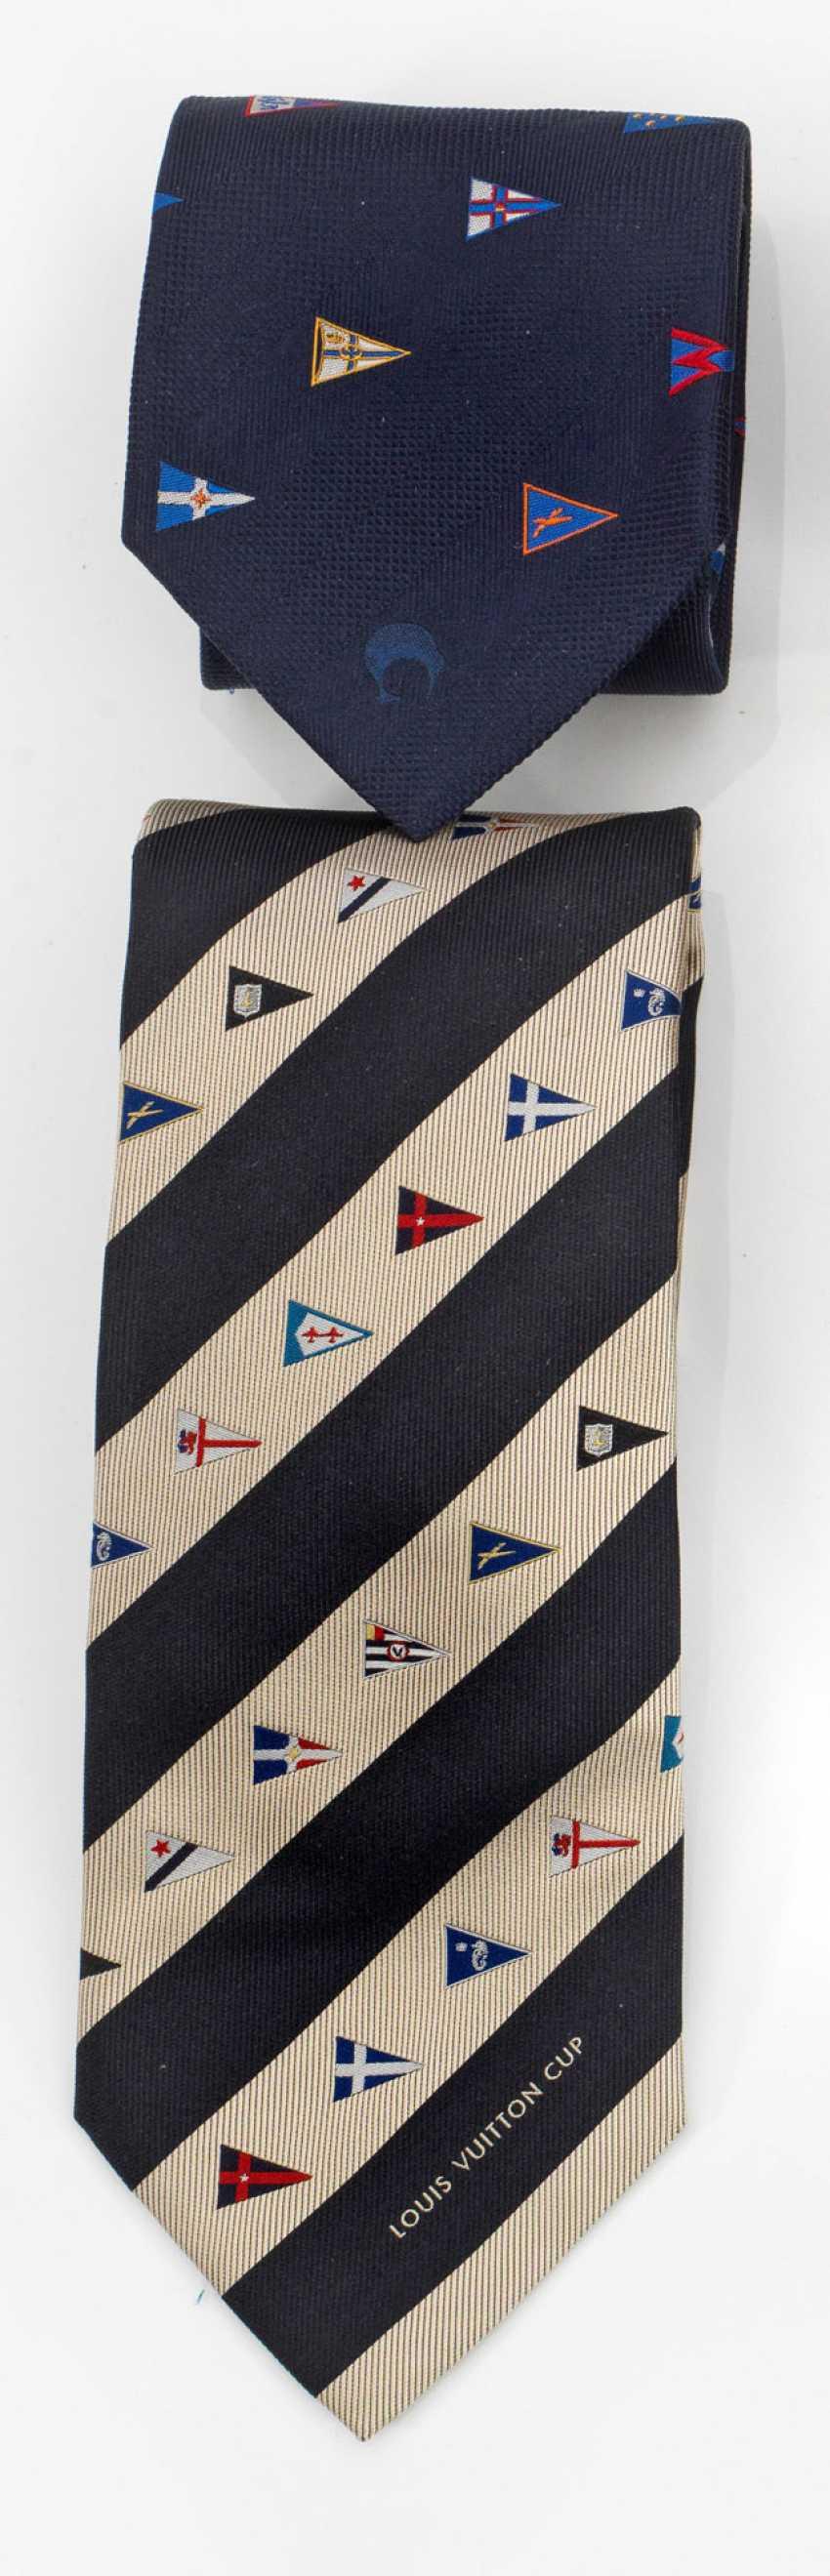 Два галстуки от Louis Vuitton - фото 1